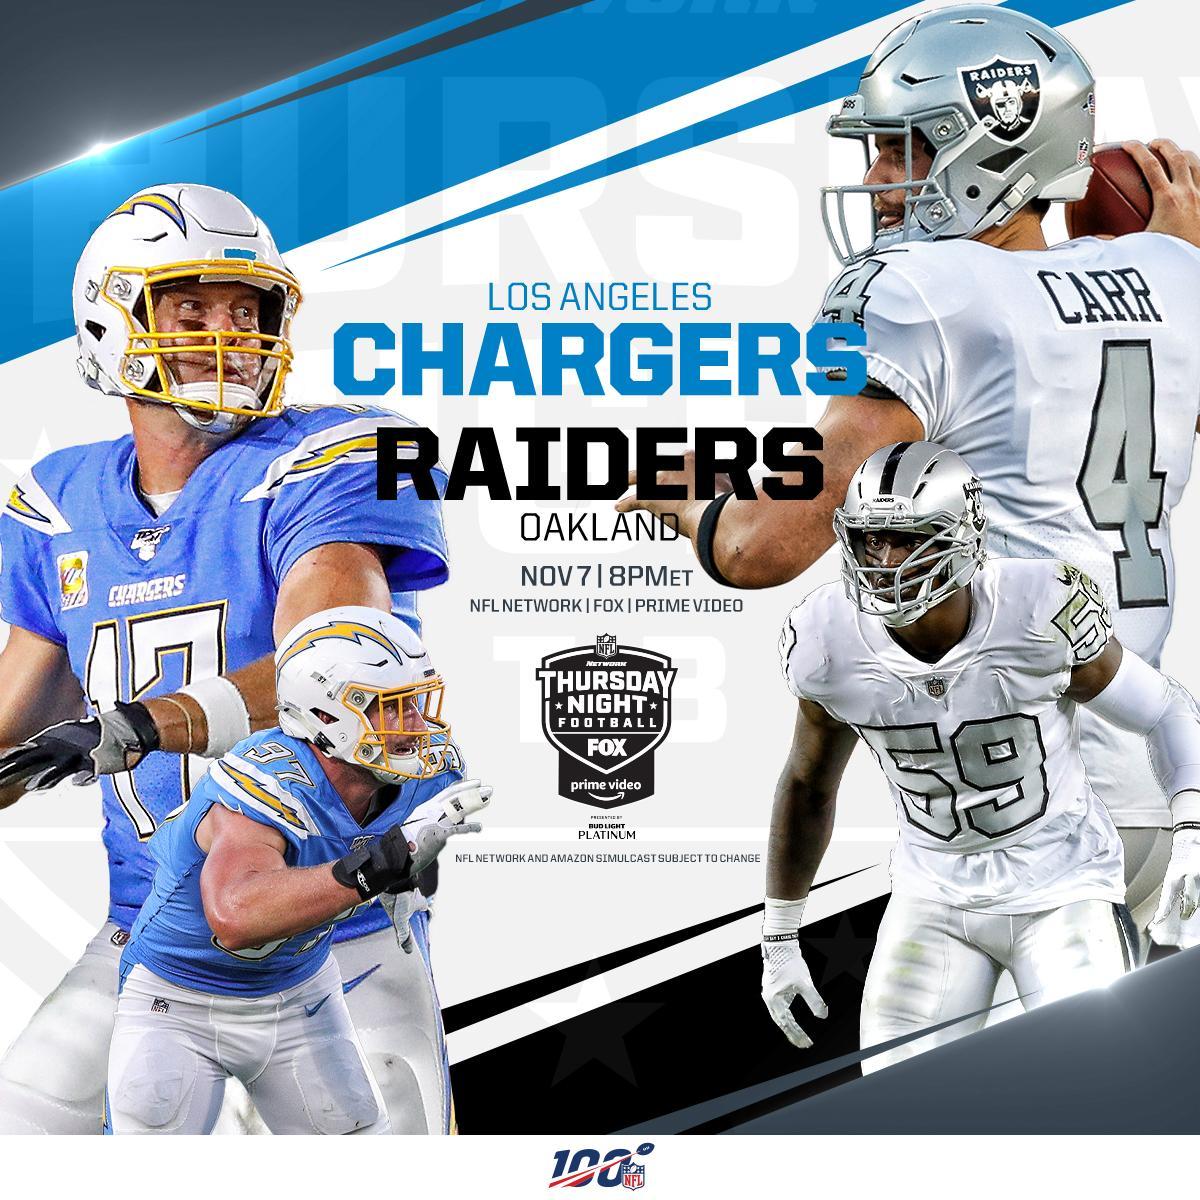 NFL Week 10: Thursday NightFootball